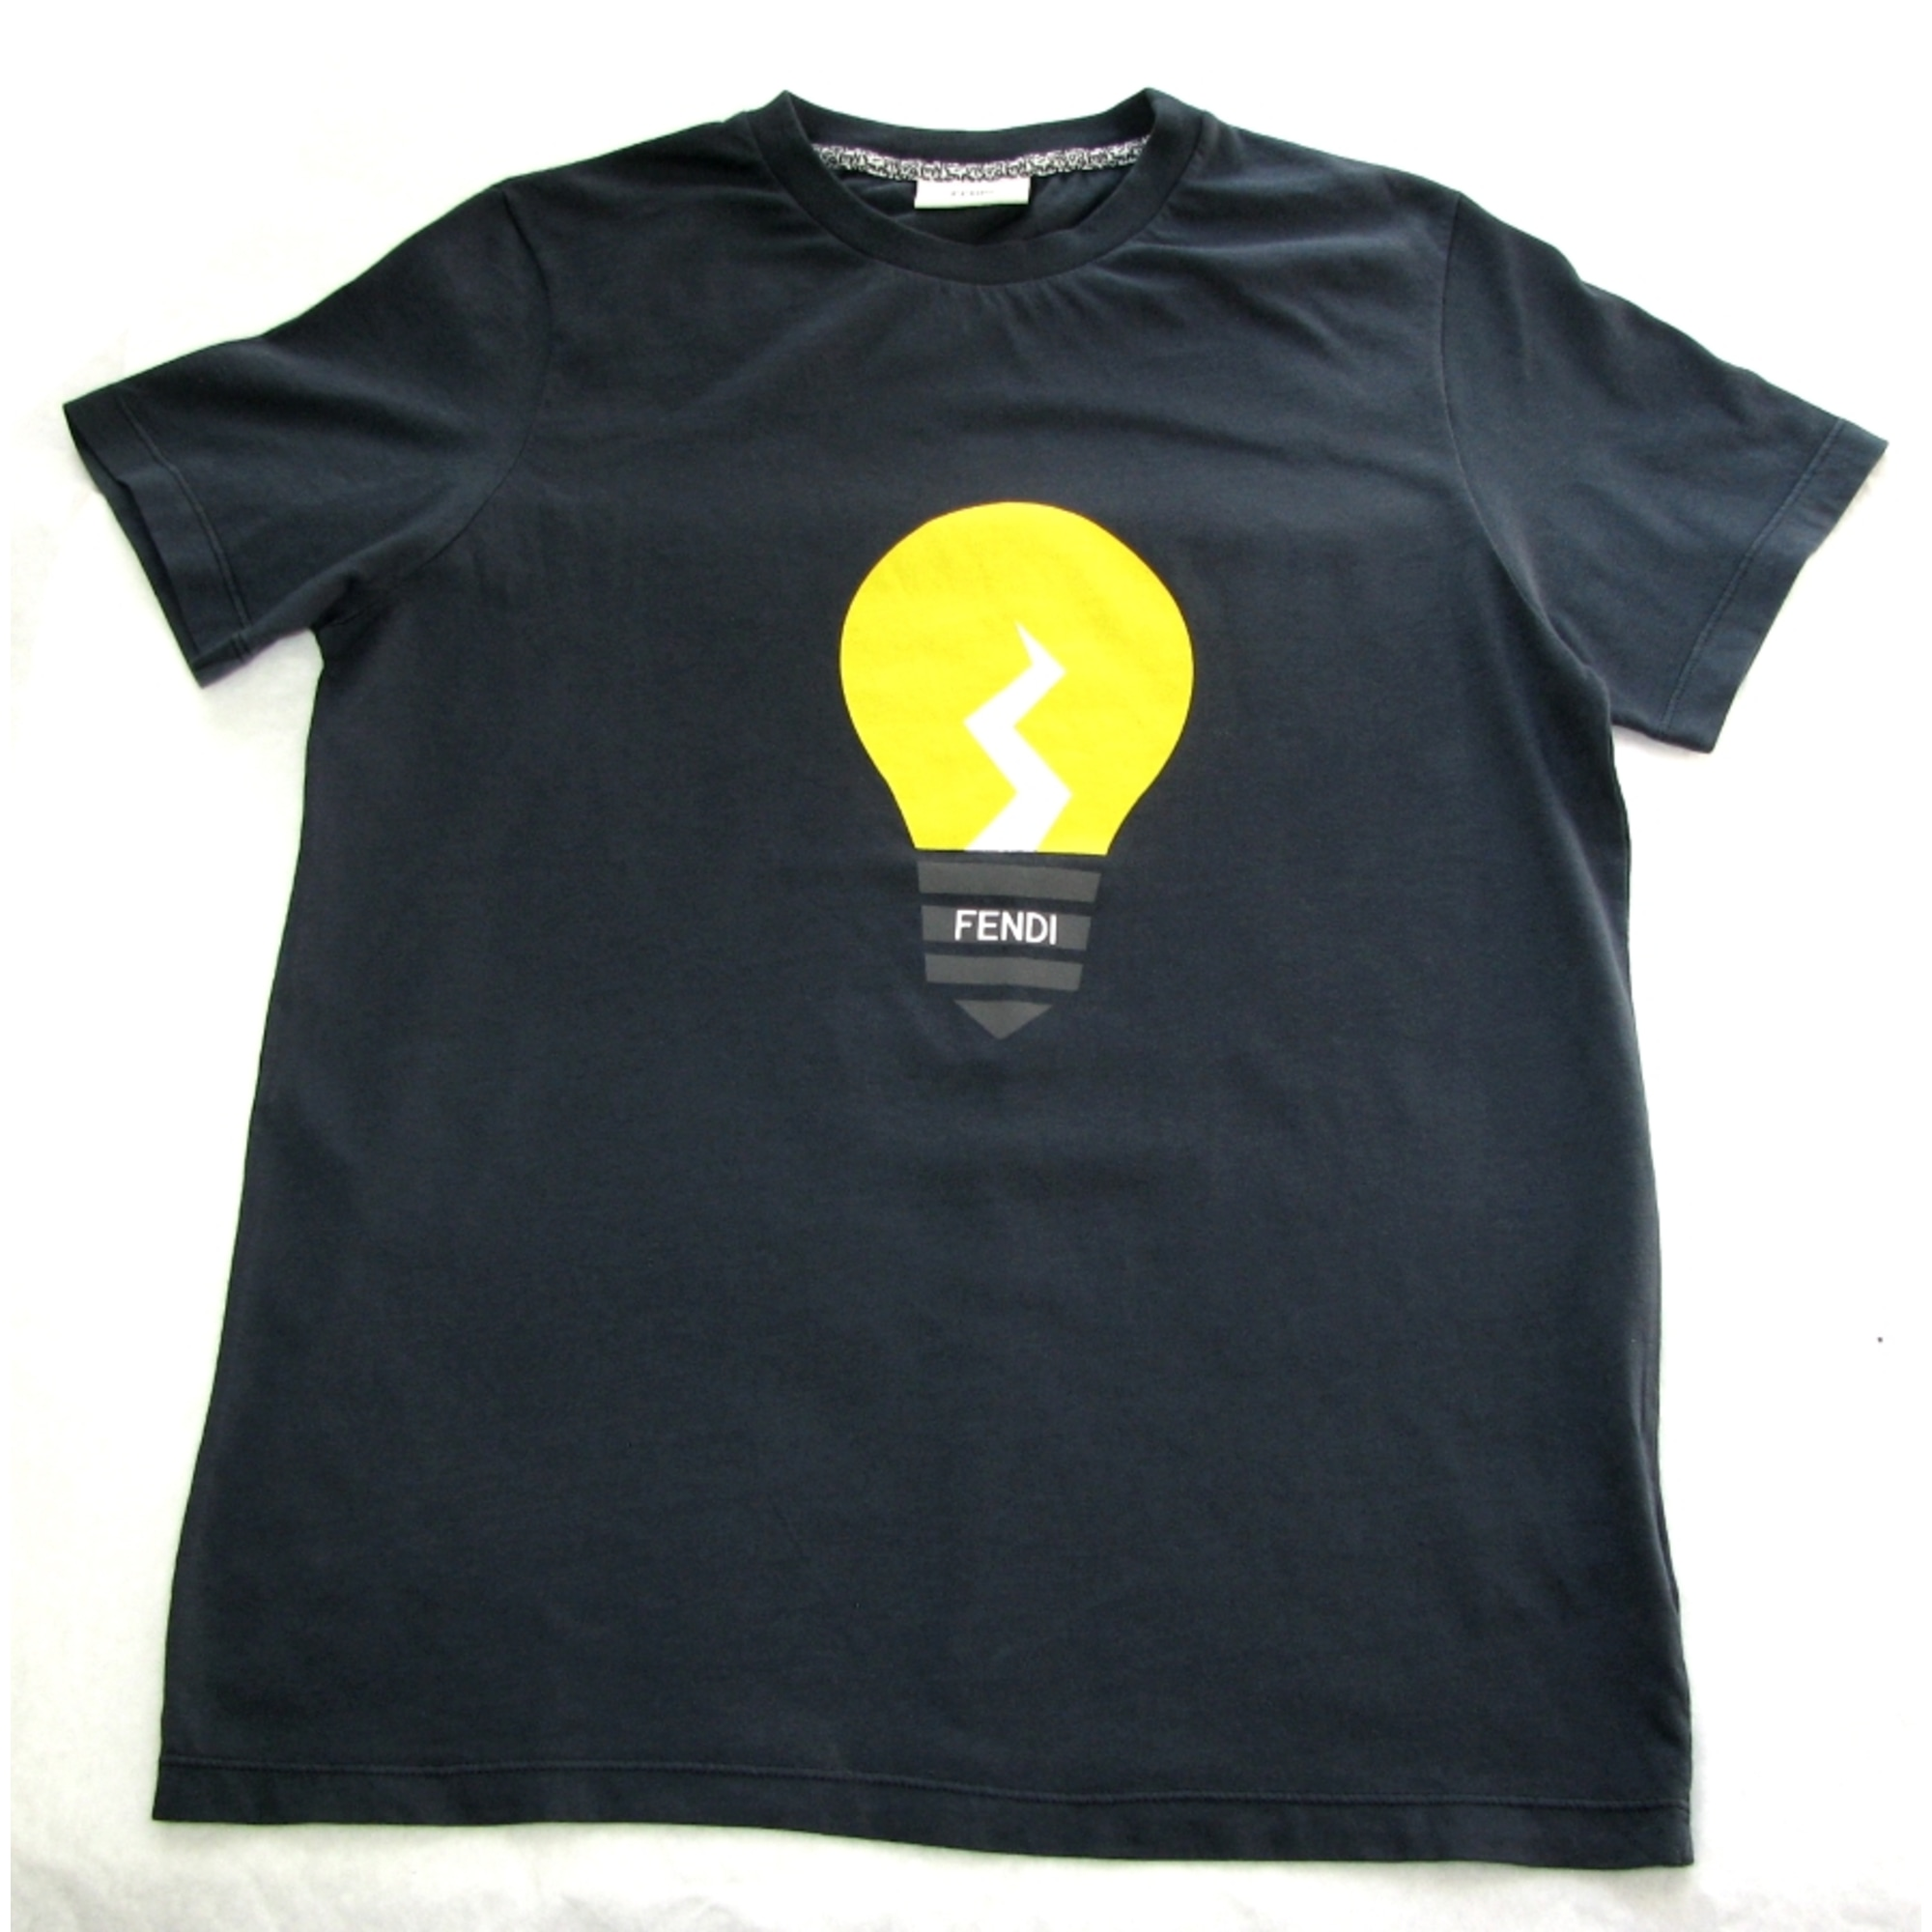 Tee-shirt FENDI 3-4 ans gris - 5558314 56dc8b4ae16